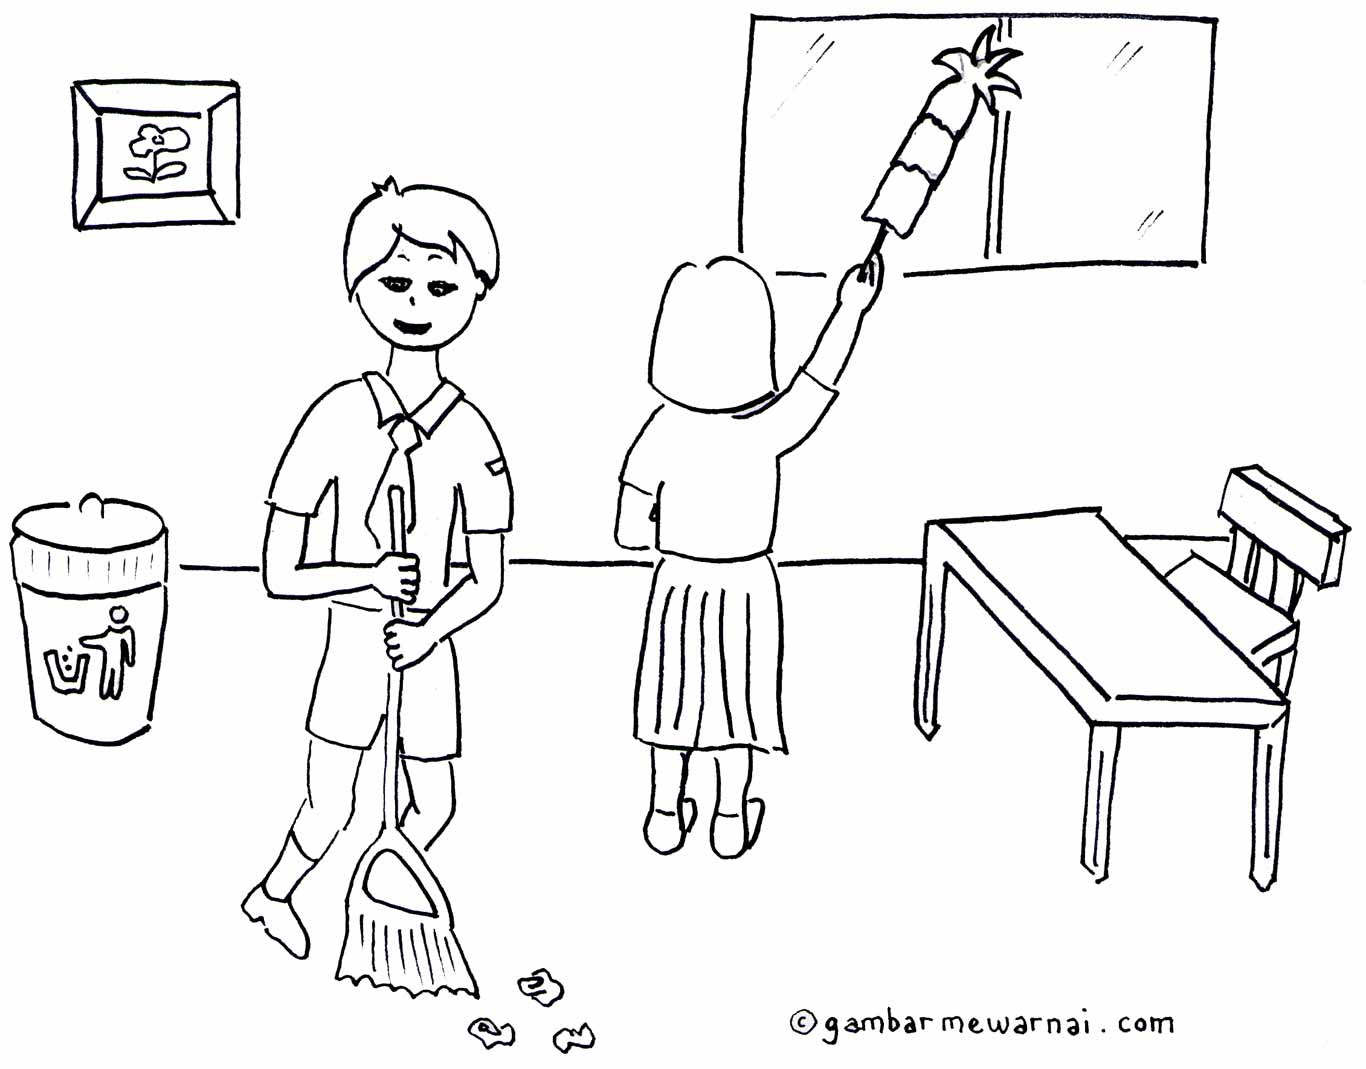 Gambar Mewarnai Kebersihan Lingkungan Sekolah Gambar